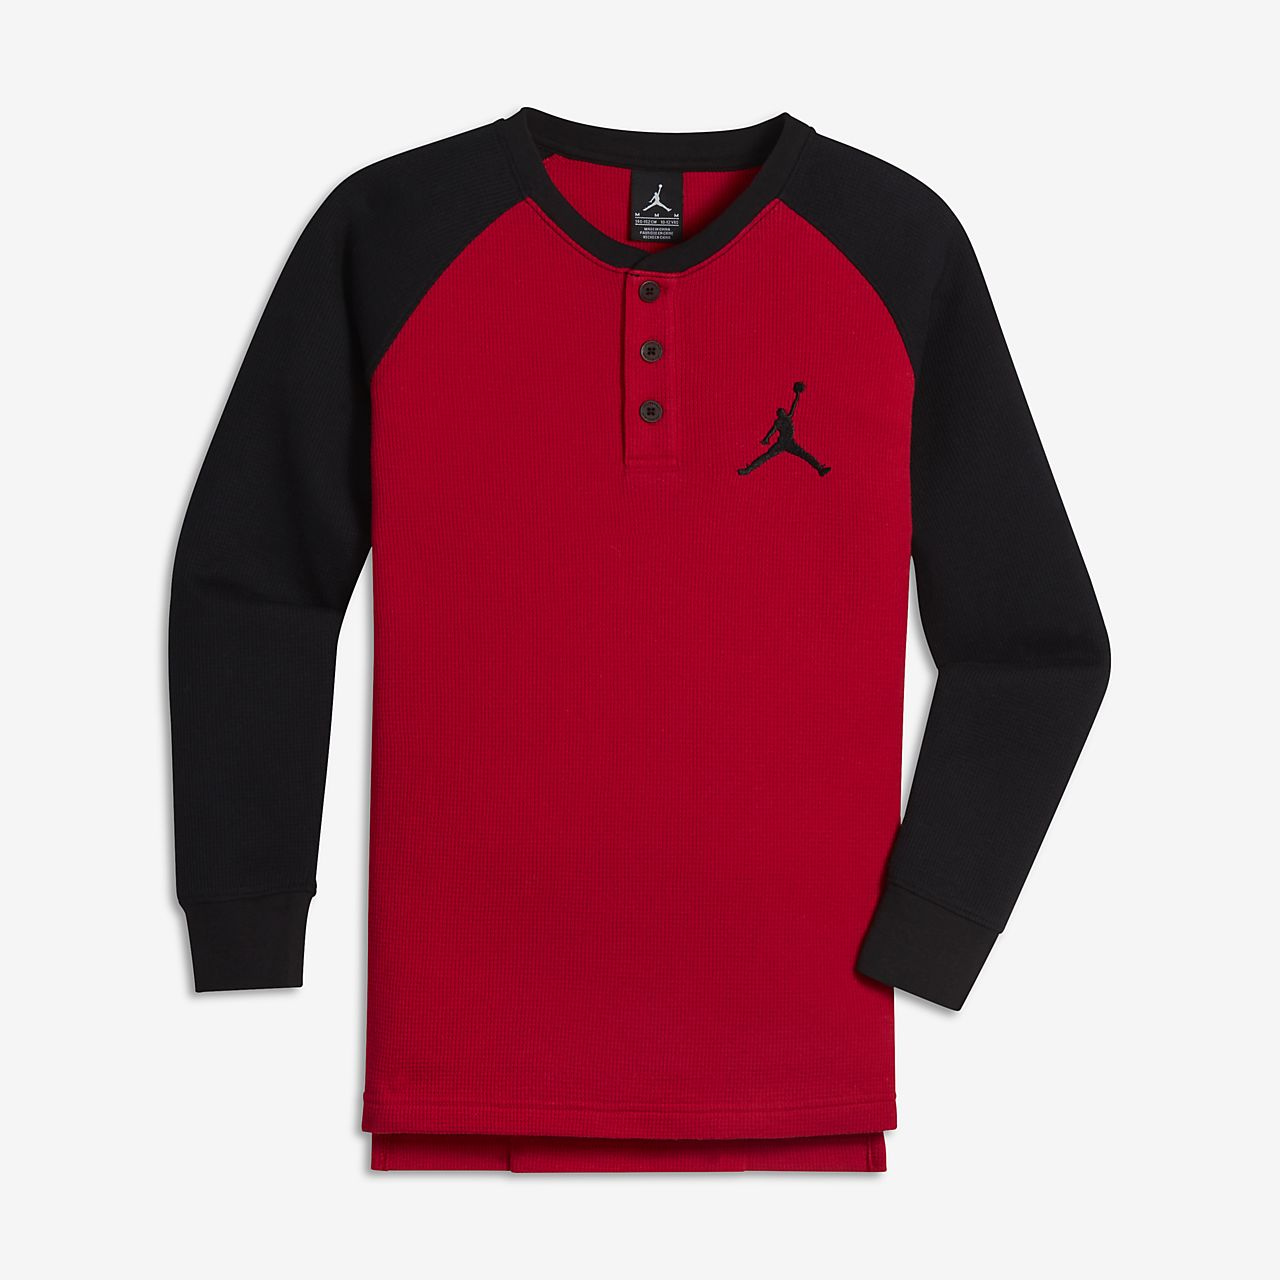 6c85c8c55e Jordan Thermal Camiseta - Niño. Nike.com ES